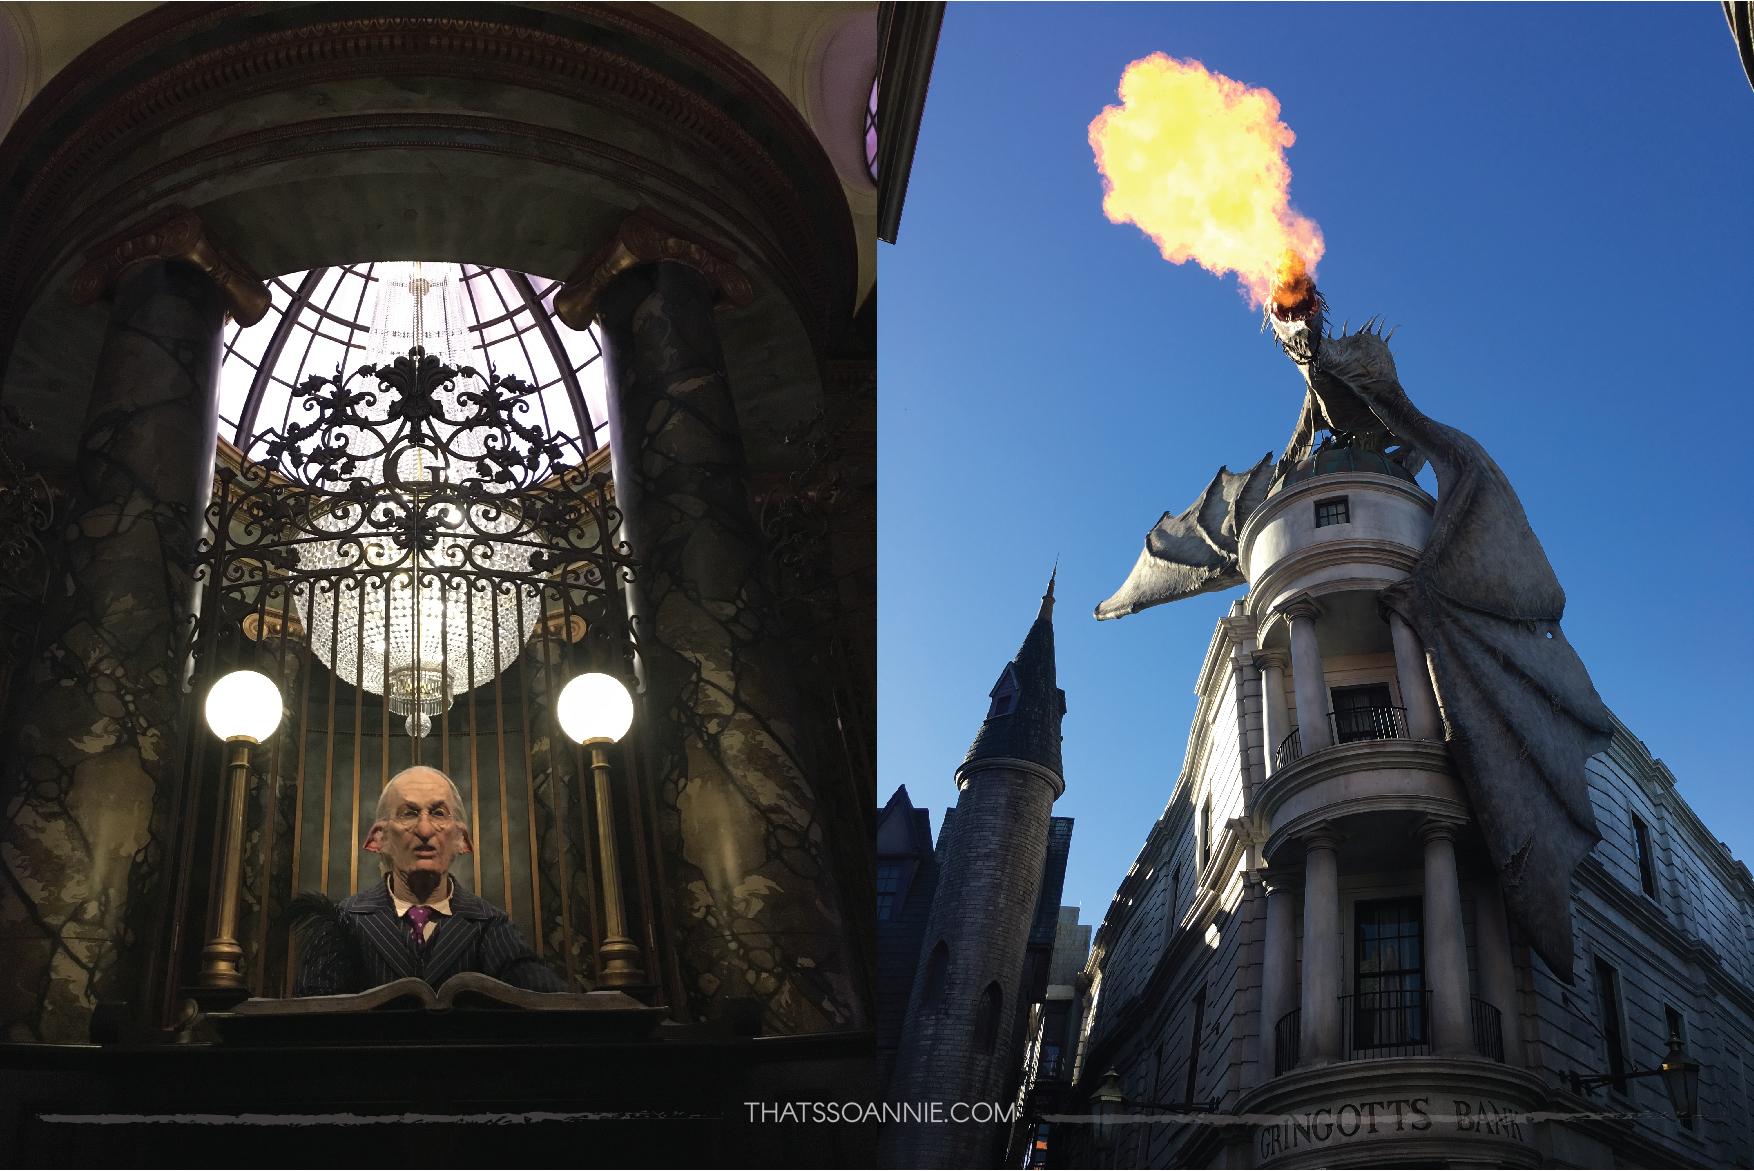 Gringotts, The Wizarding World of Harry Potter